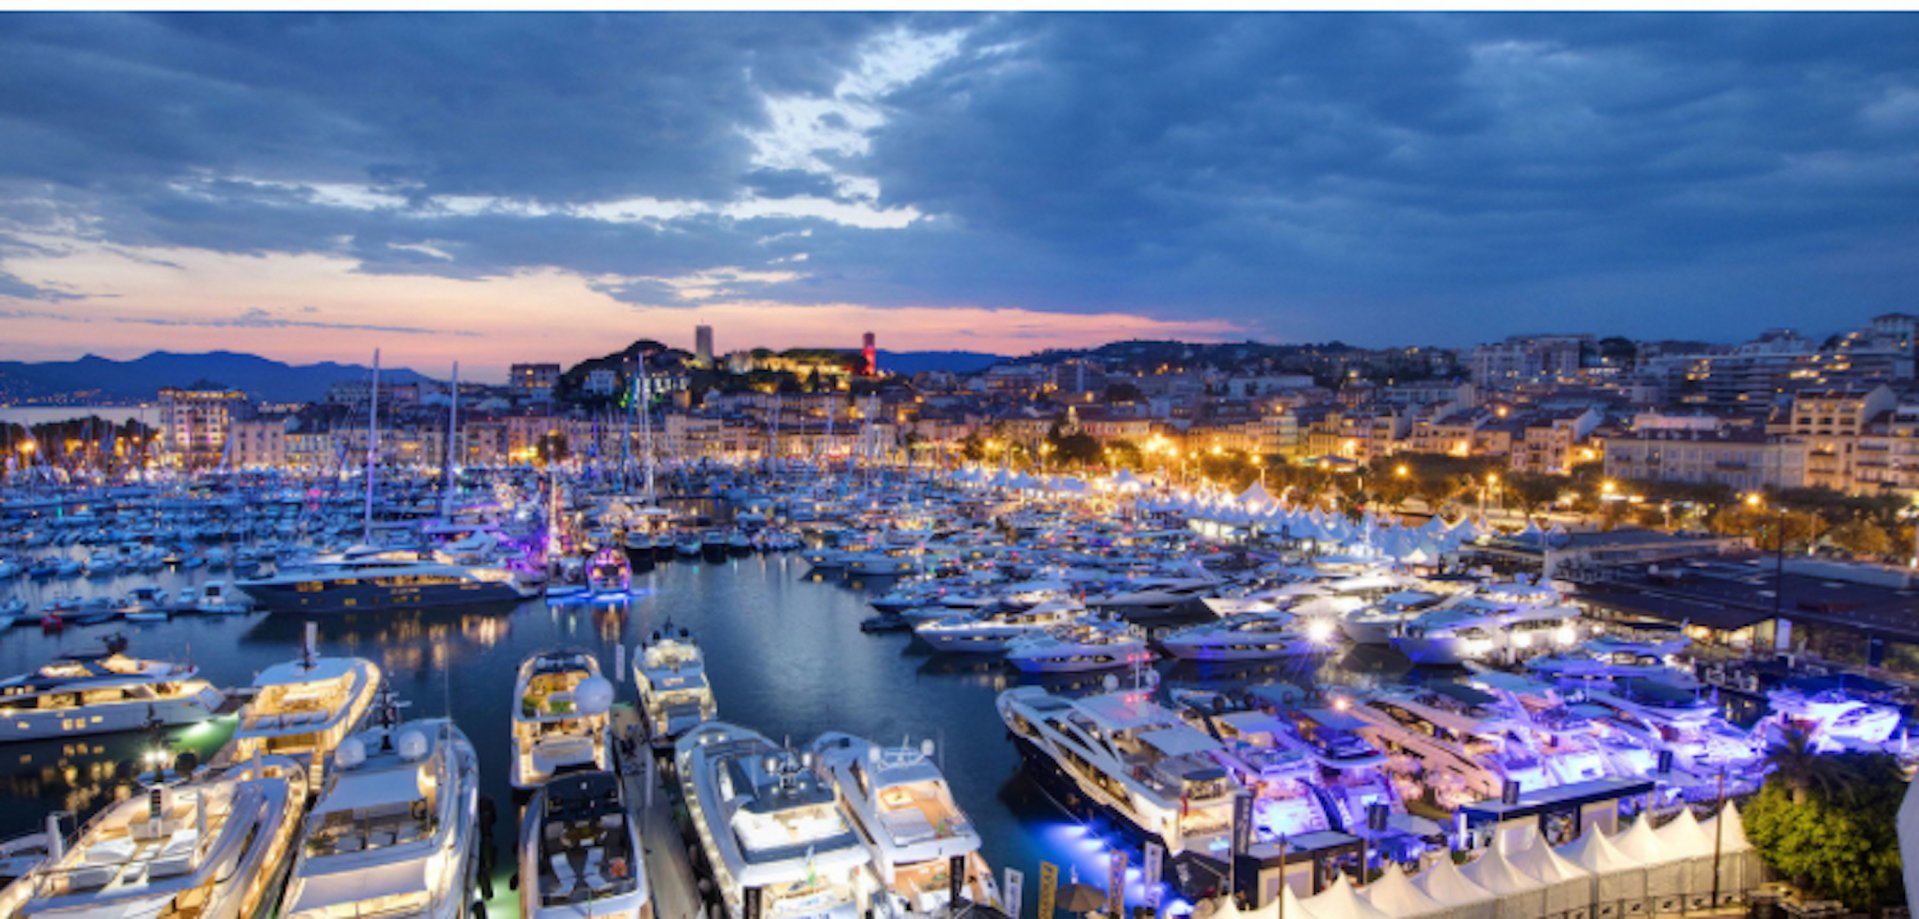 Cannes 1 minute Palais, Croisette and beaches